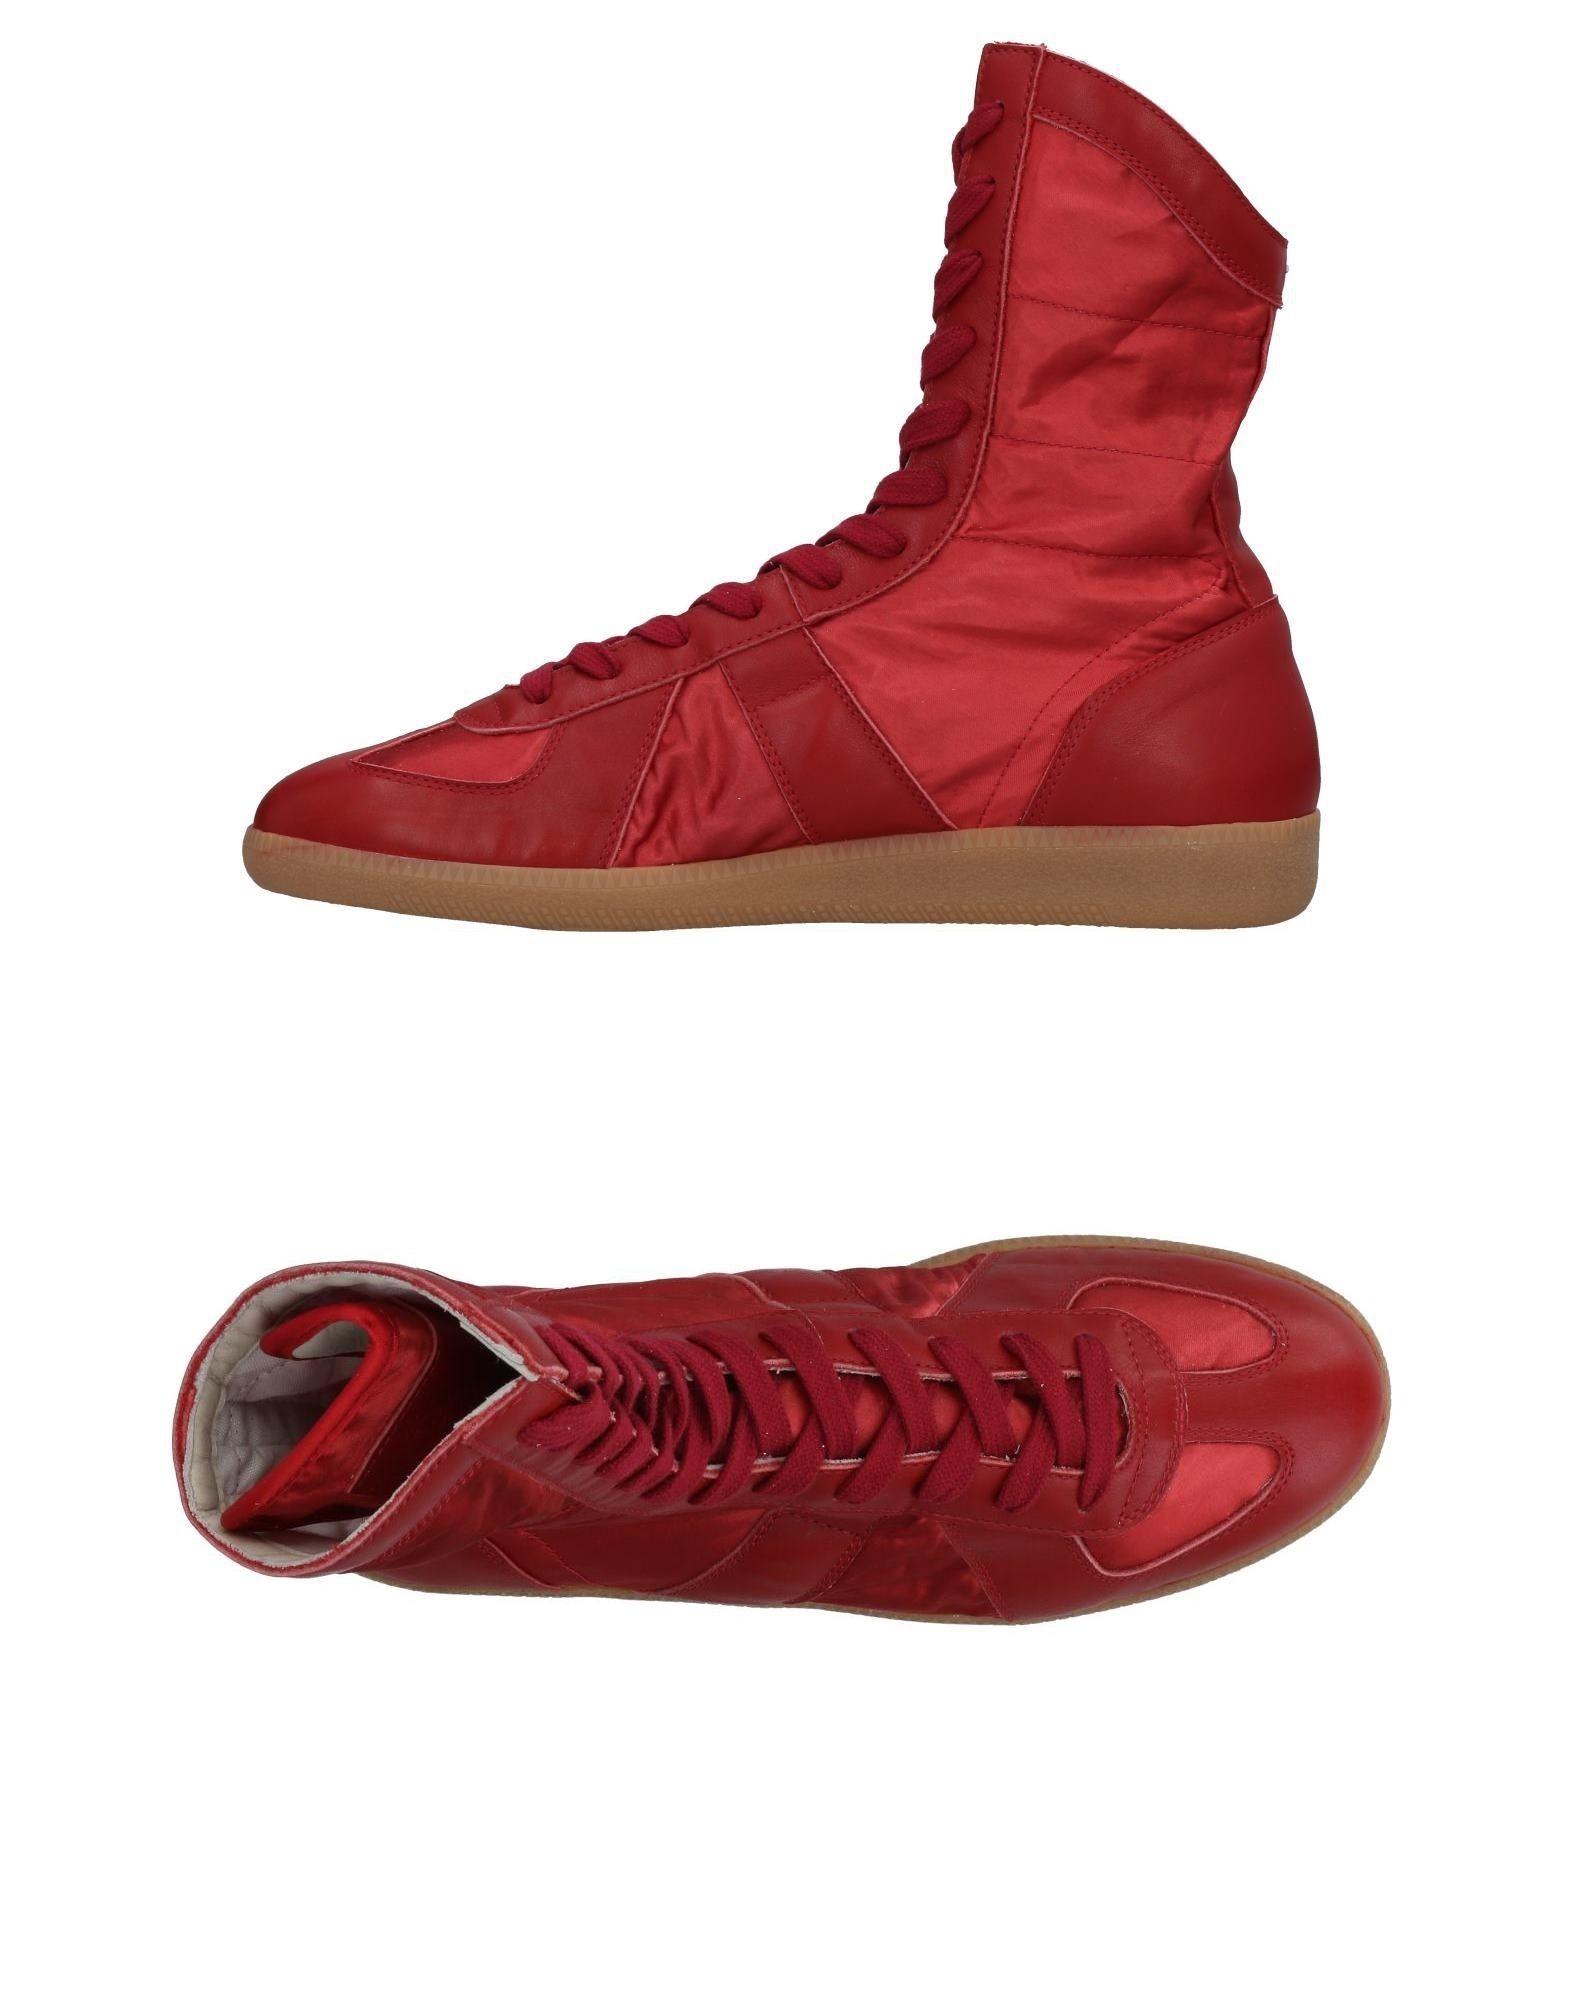 Maison Margiela Sneakers Herren Preis-Leistungs-Verhältnis, Gutes Preis-Leistungs-Verhältnis, Herren es lohnt sich b11a36